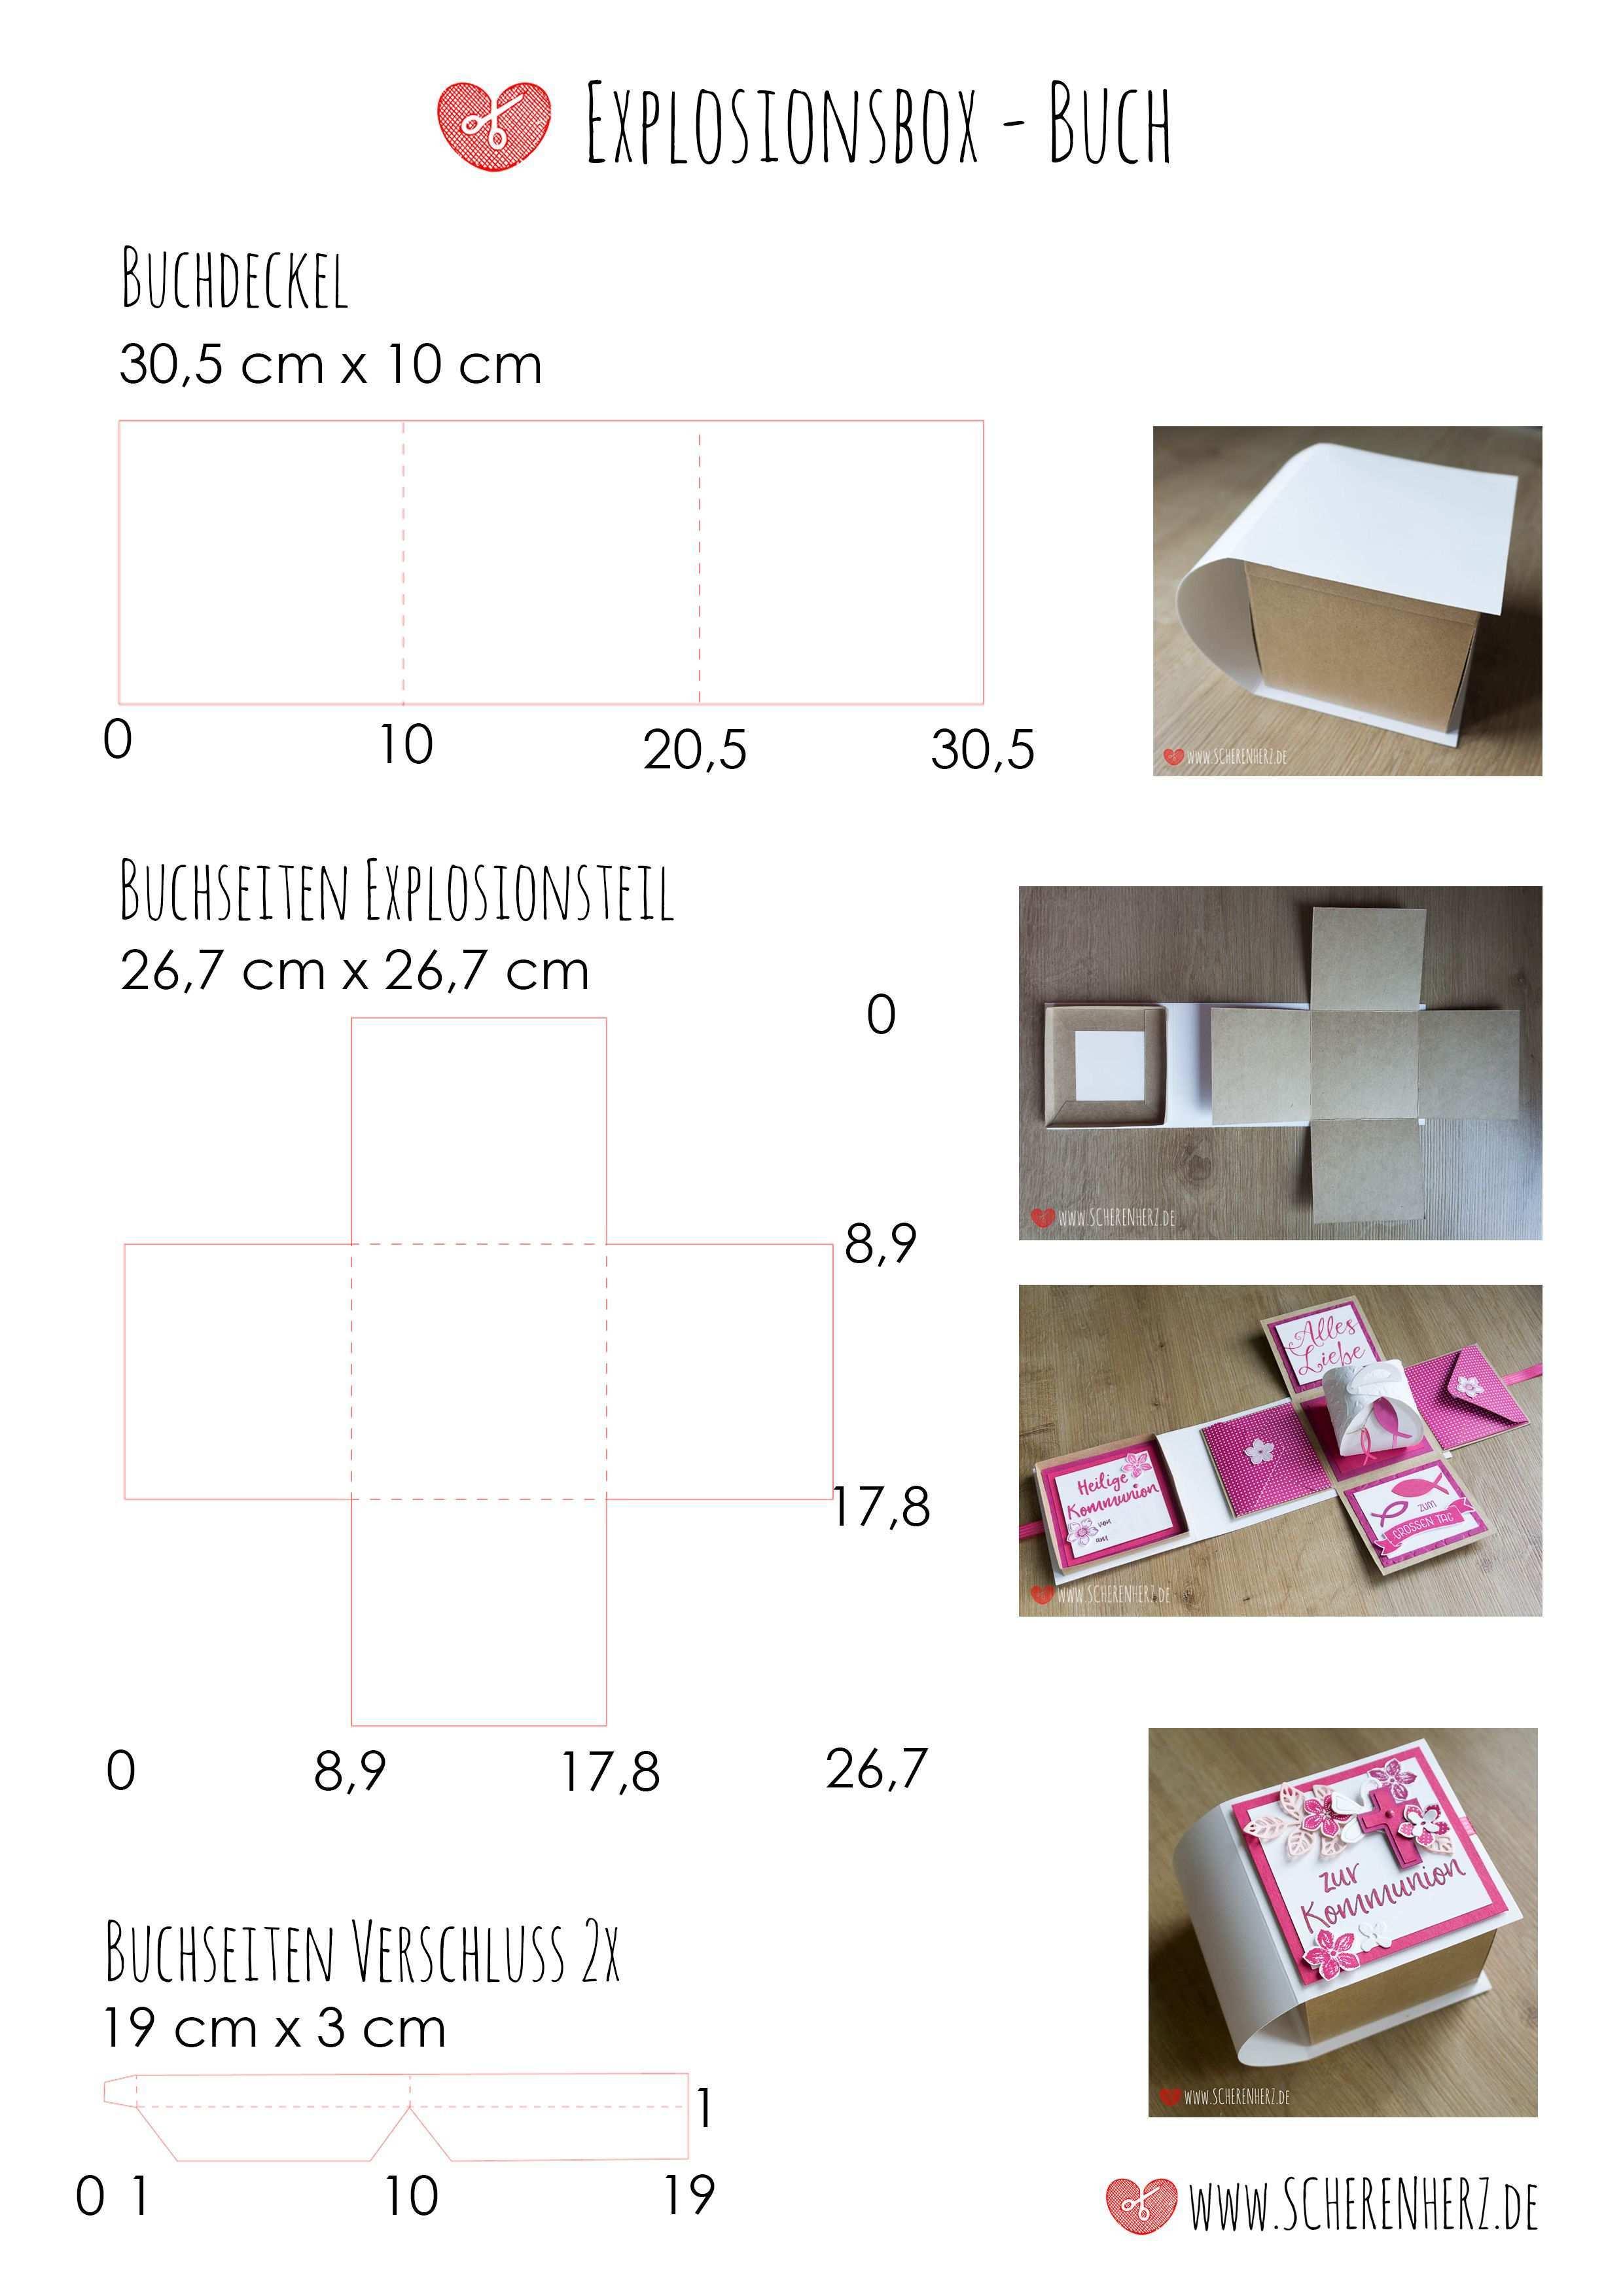 Anleitung Explosionsbuch Anleitungen Scherenherz Explosionsbox Box Geschenkbox Basteln Anleitung